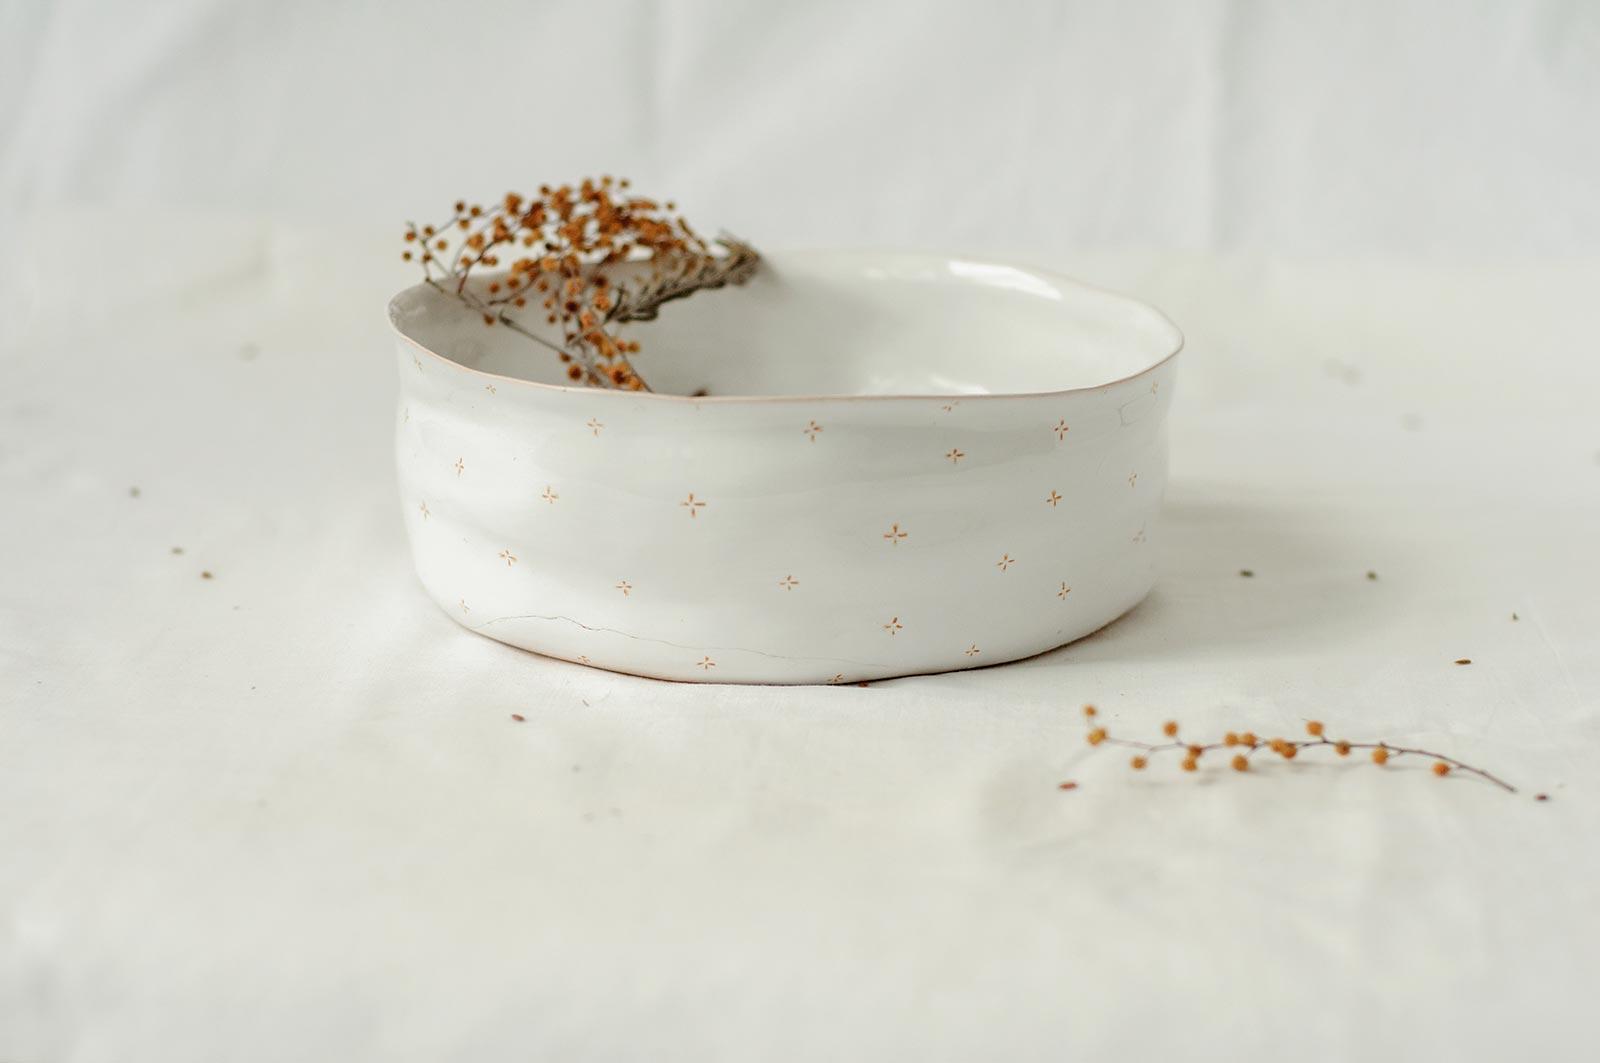 Big deep plate from ceramics (Handmade)